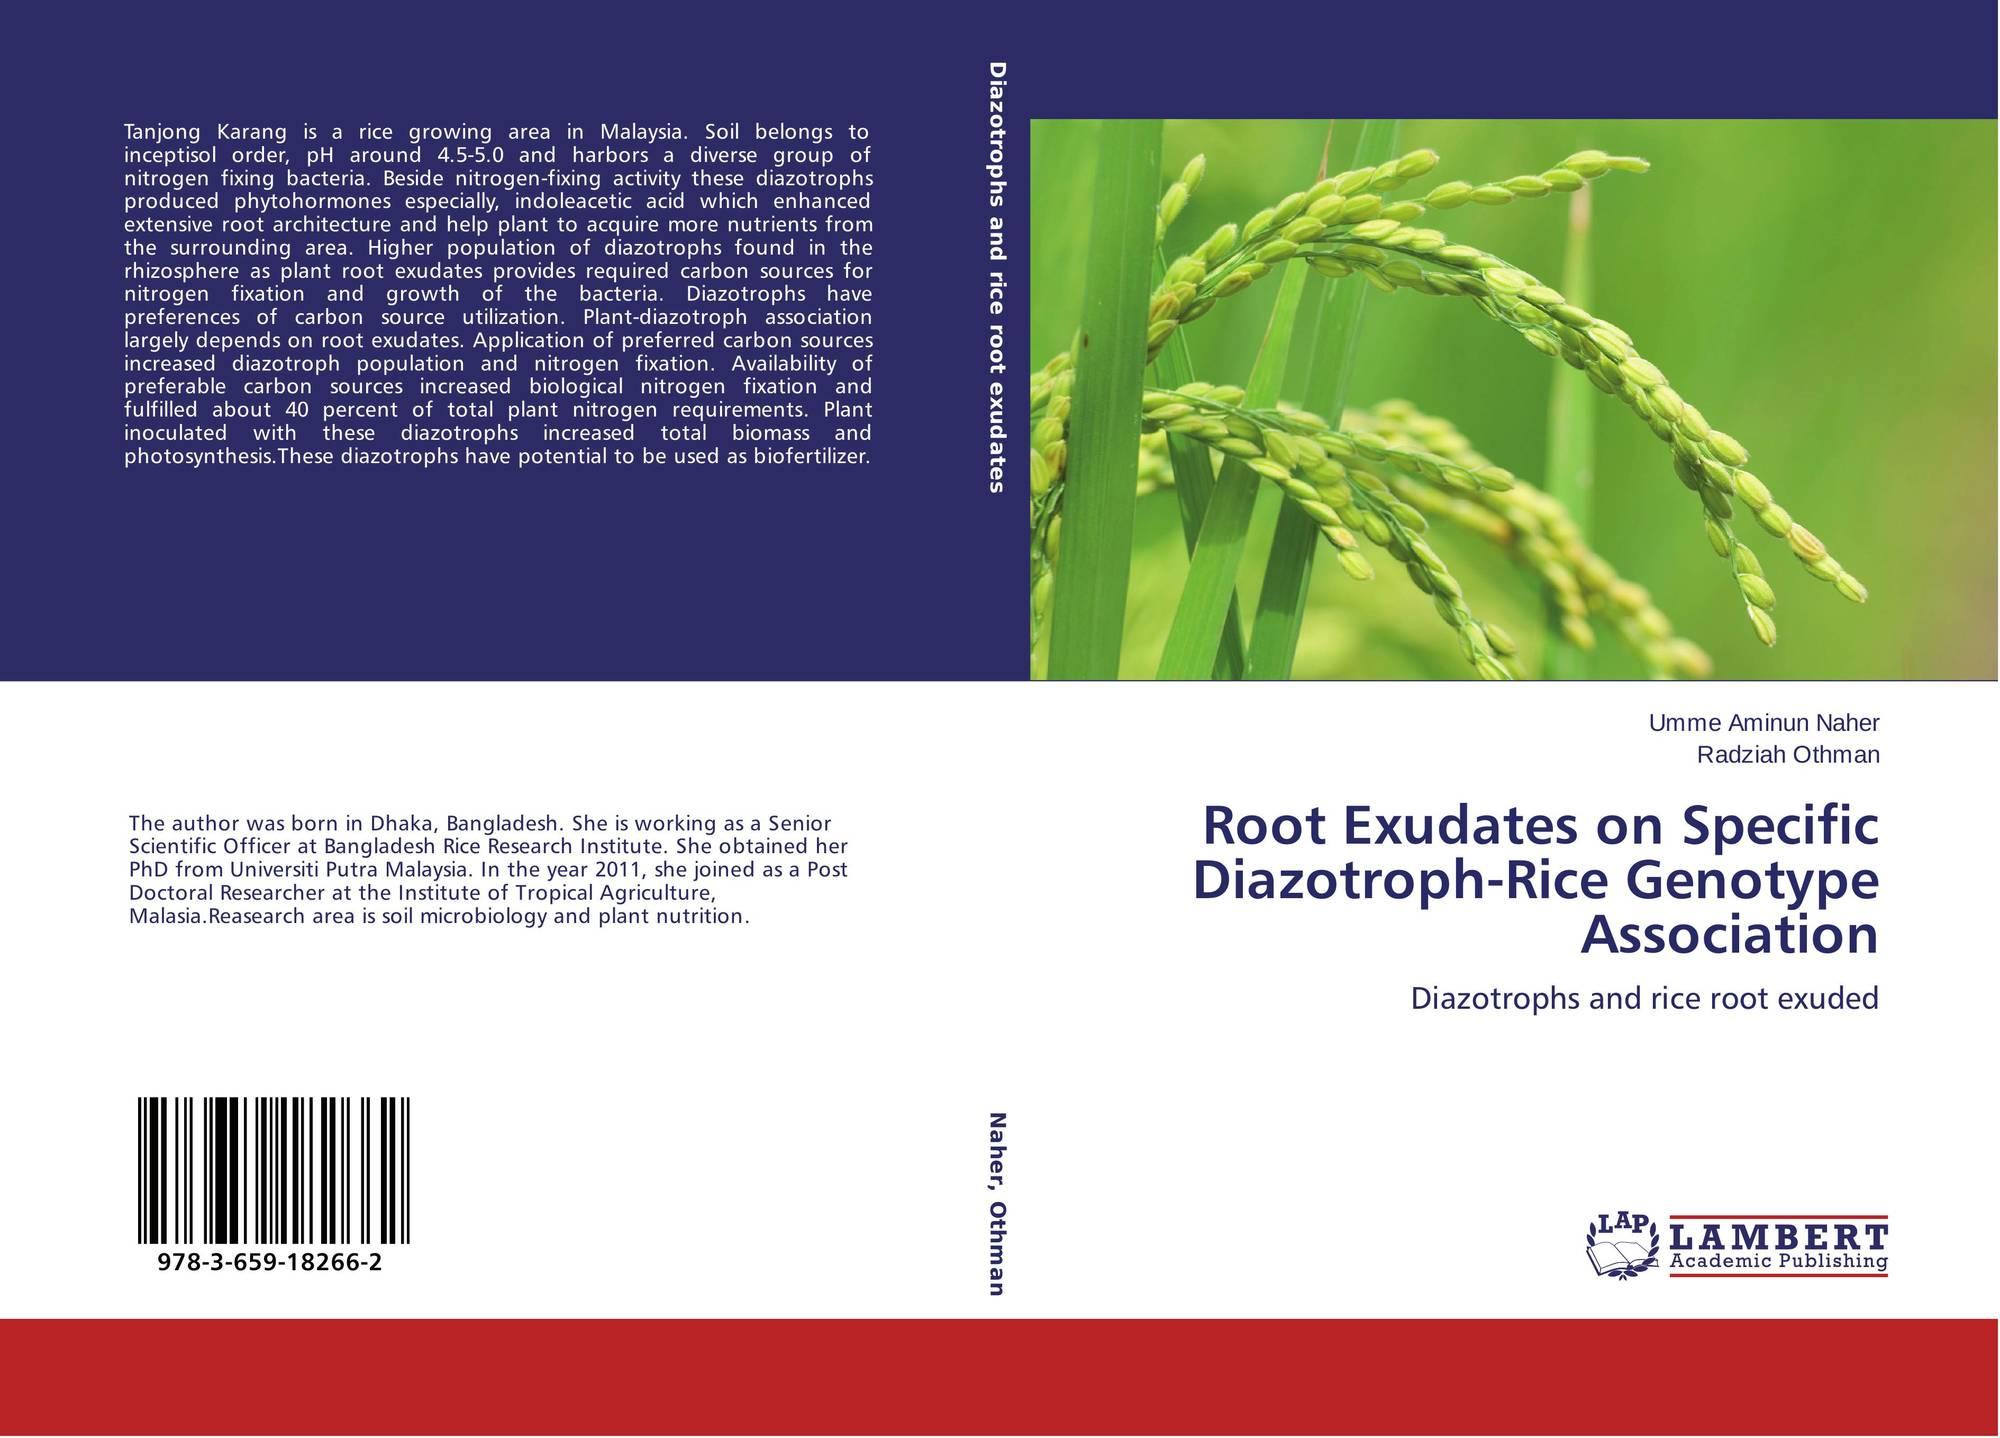 download perspectives on semantics, pragmatics, and discourse: a festschrift